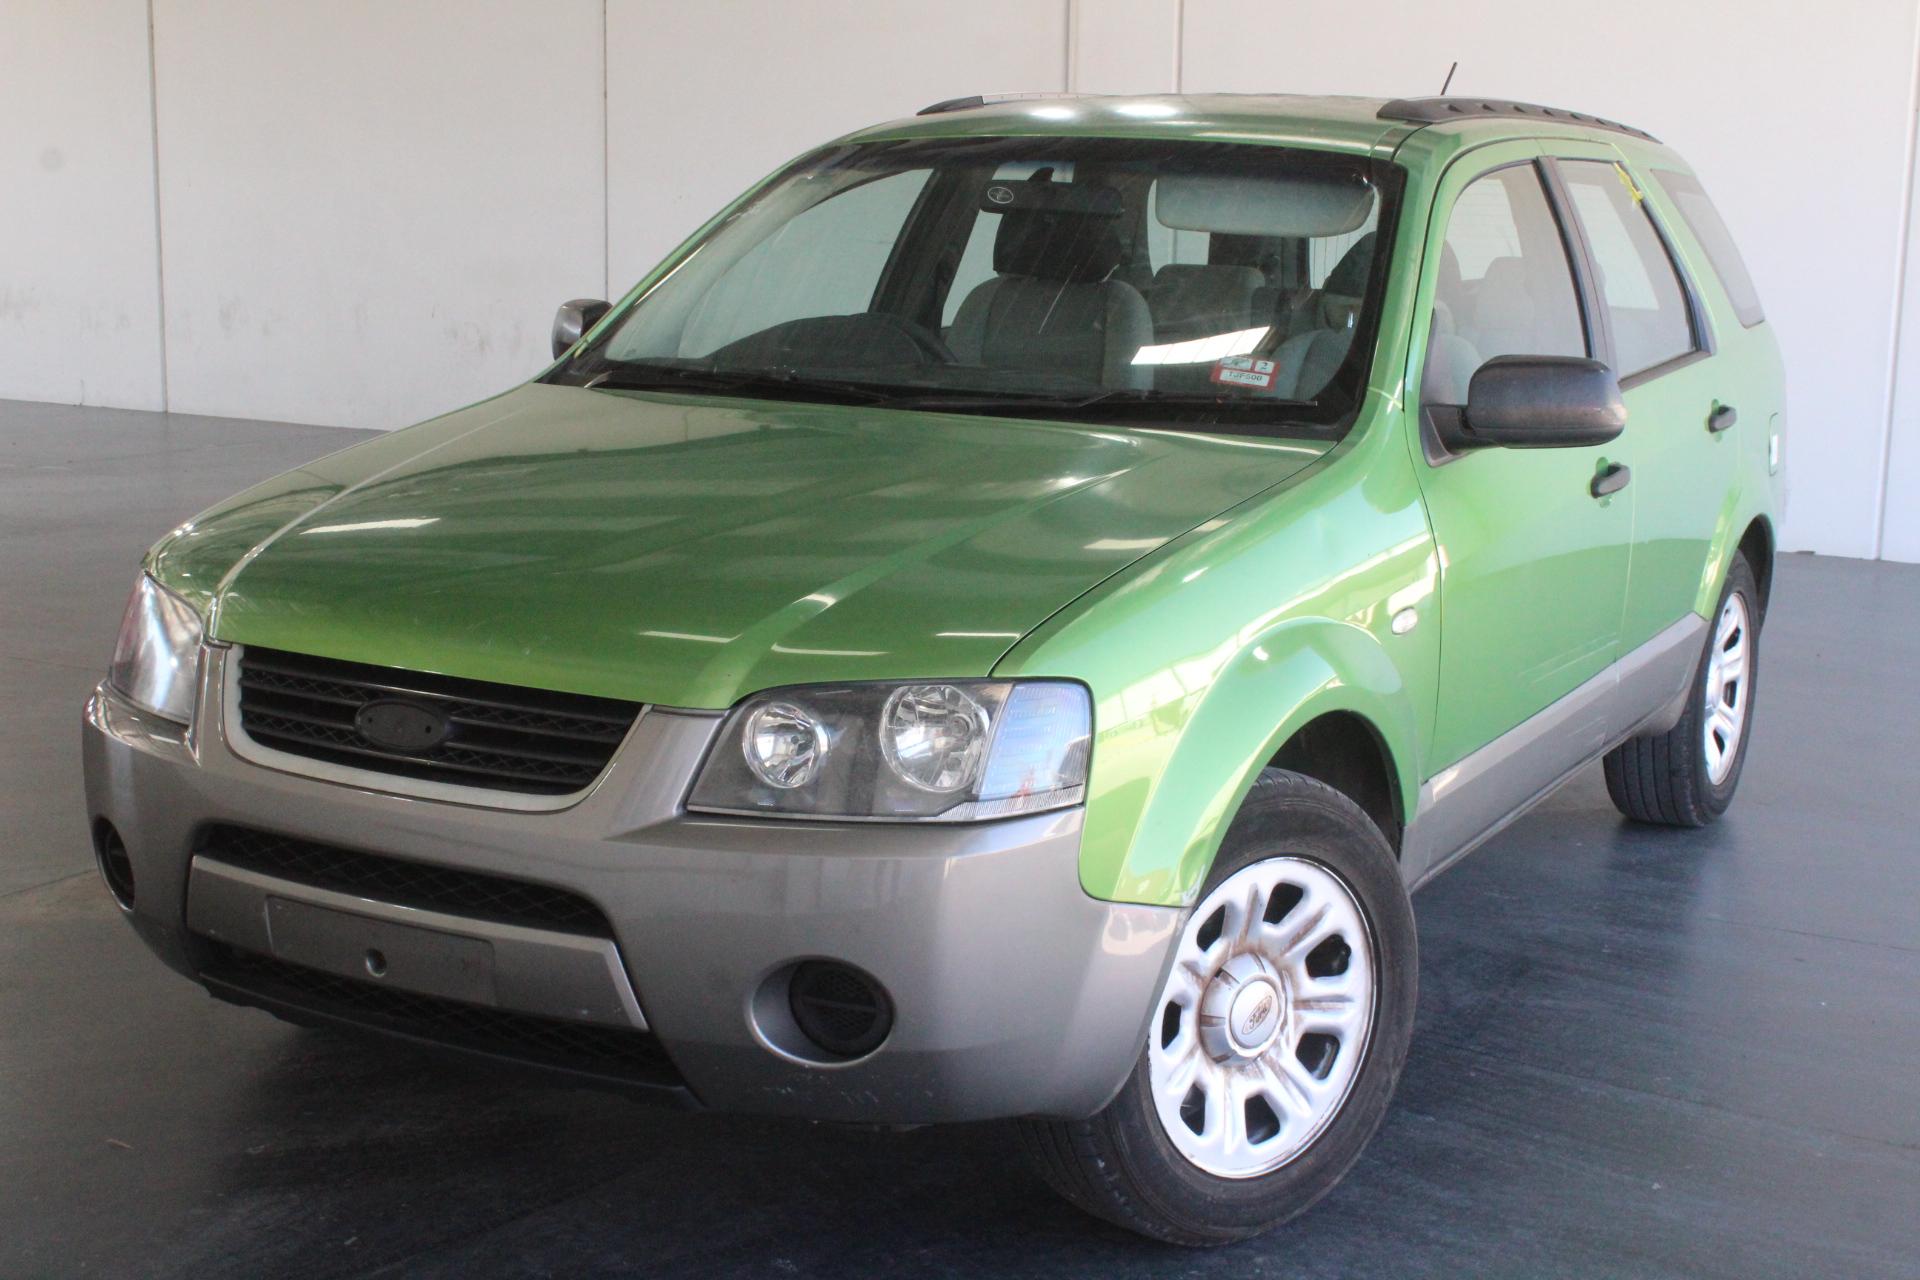 2005 Ford Territory TX (RWD) SX Automatic 7 Seats Wagon